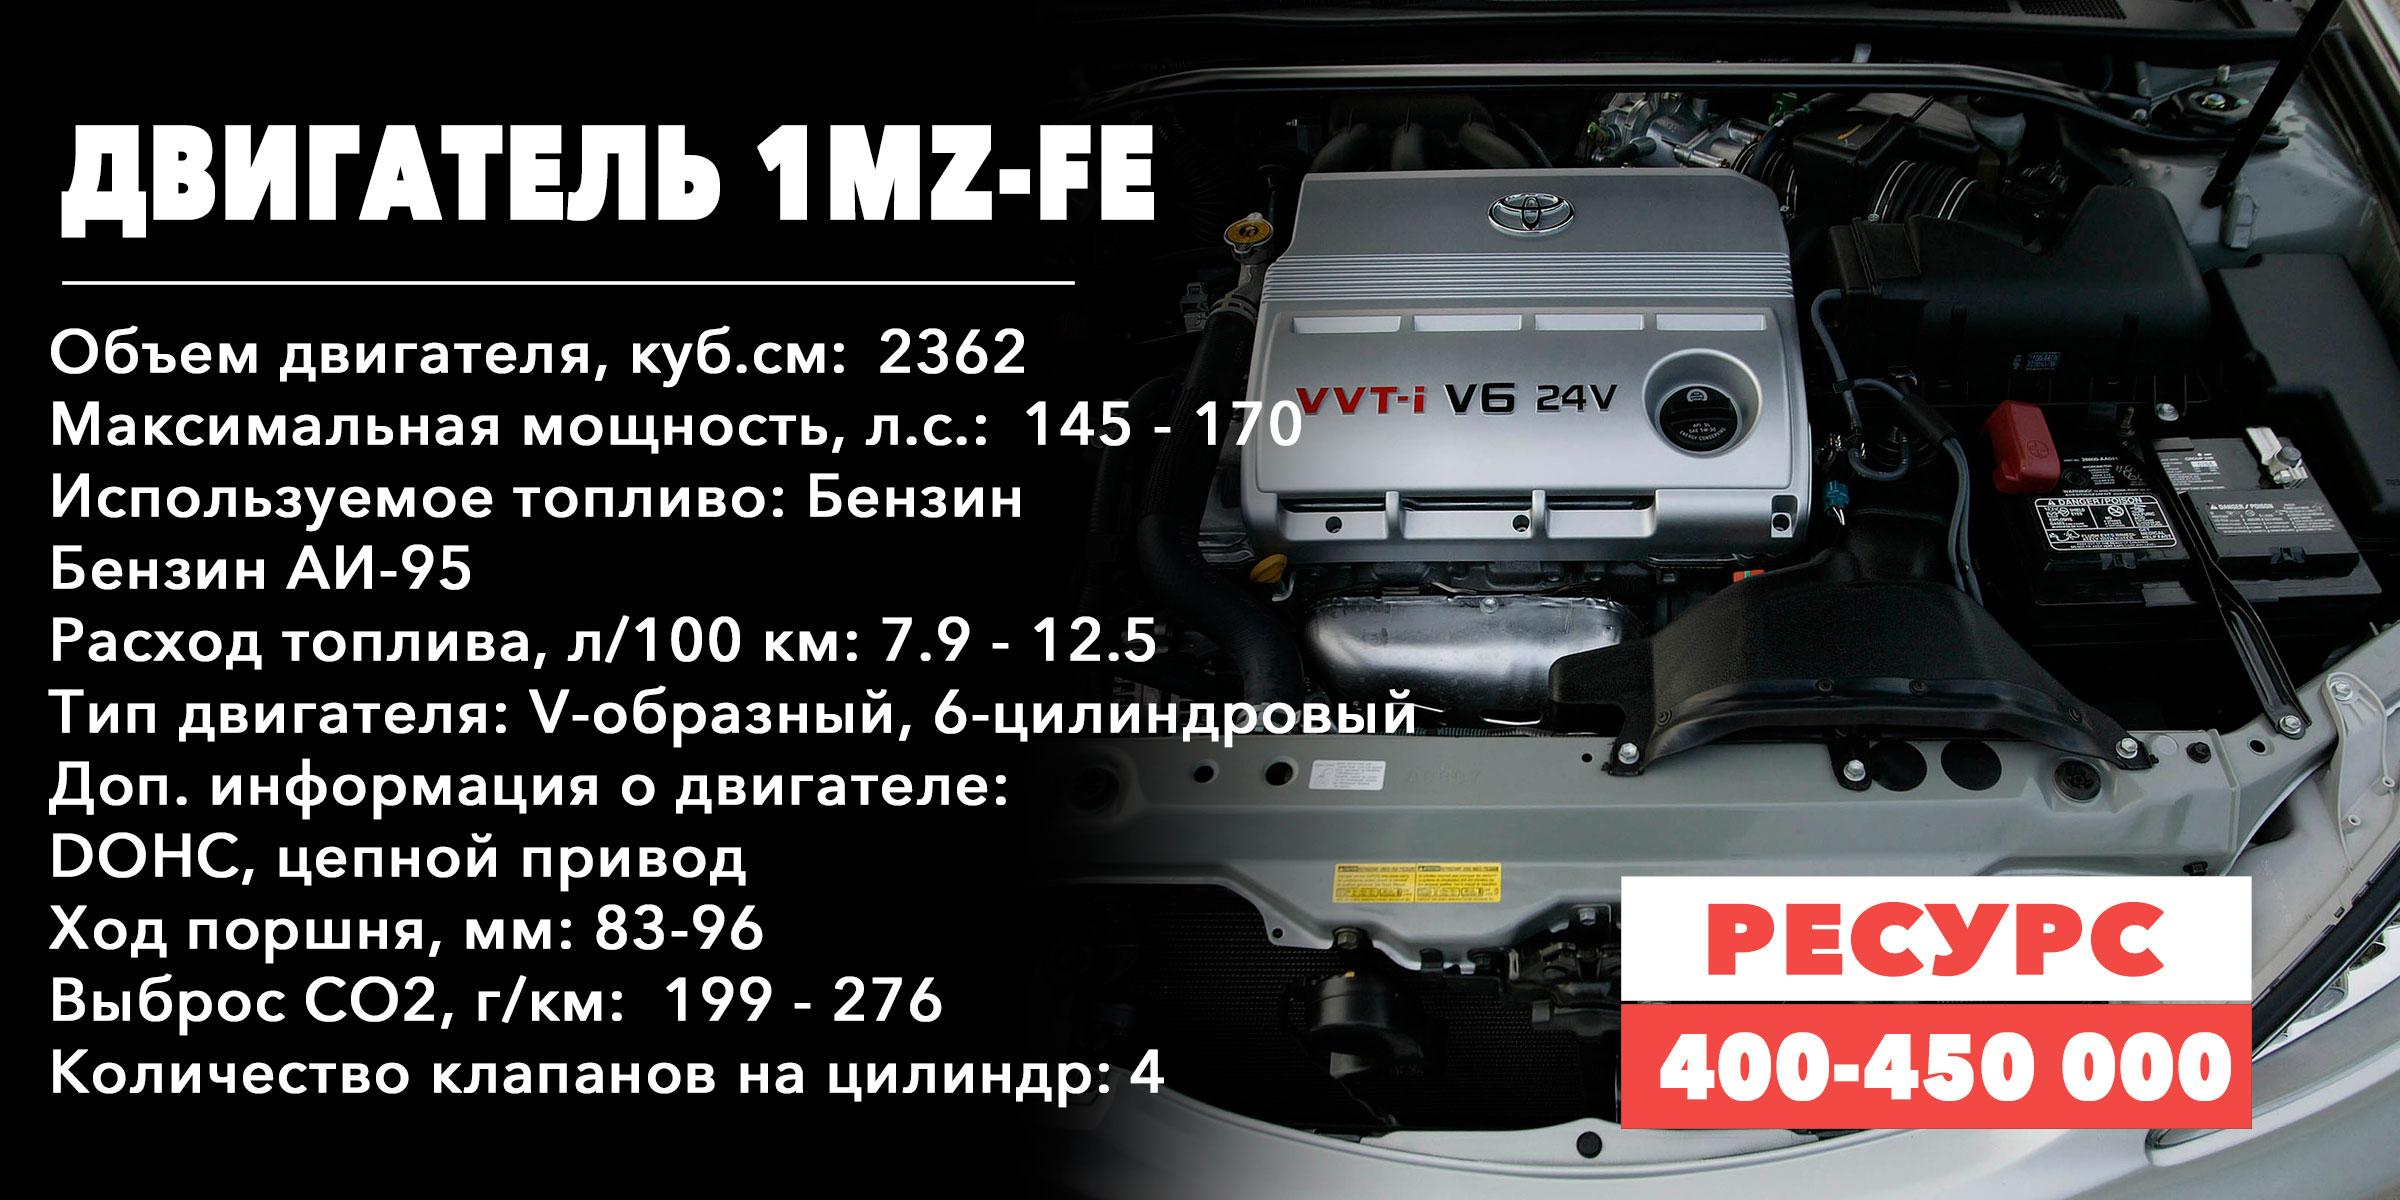 Ресурс моторов семейства MZ (1MZ-FE)